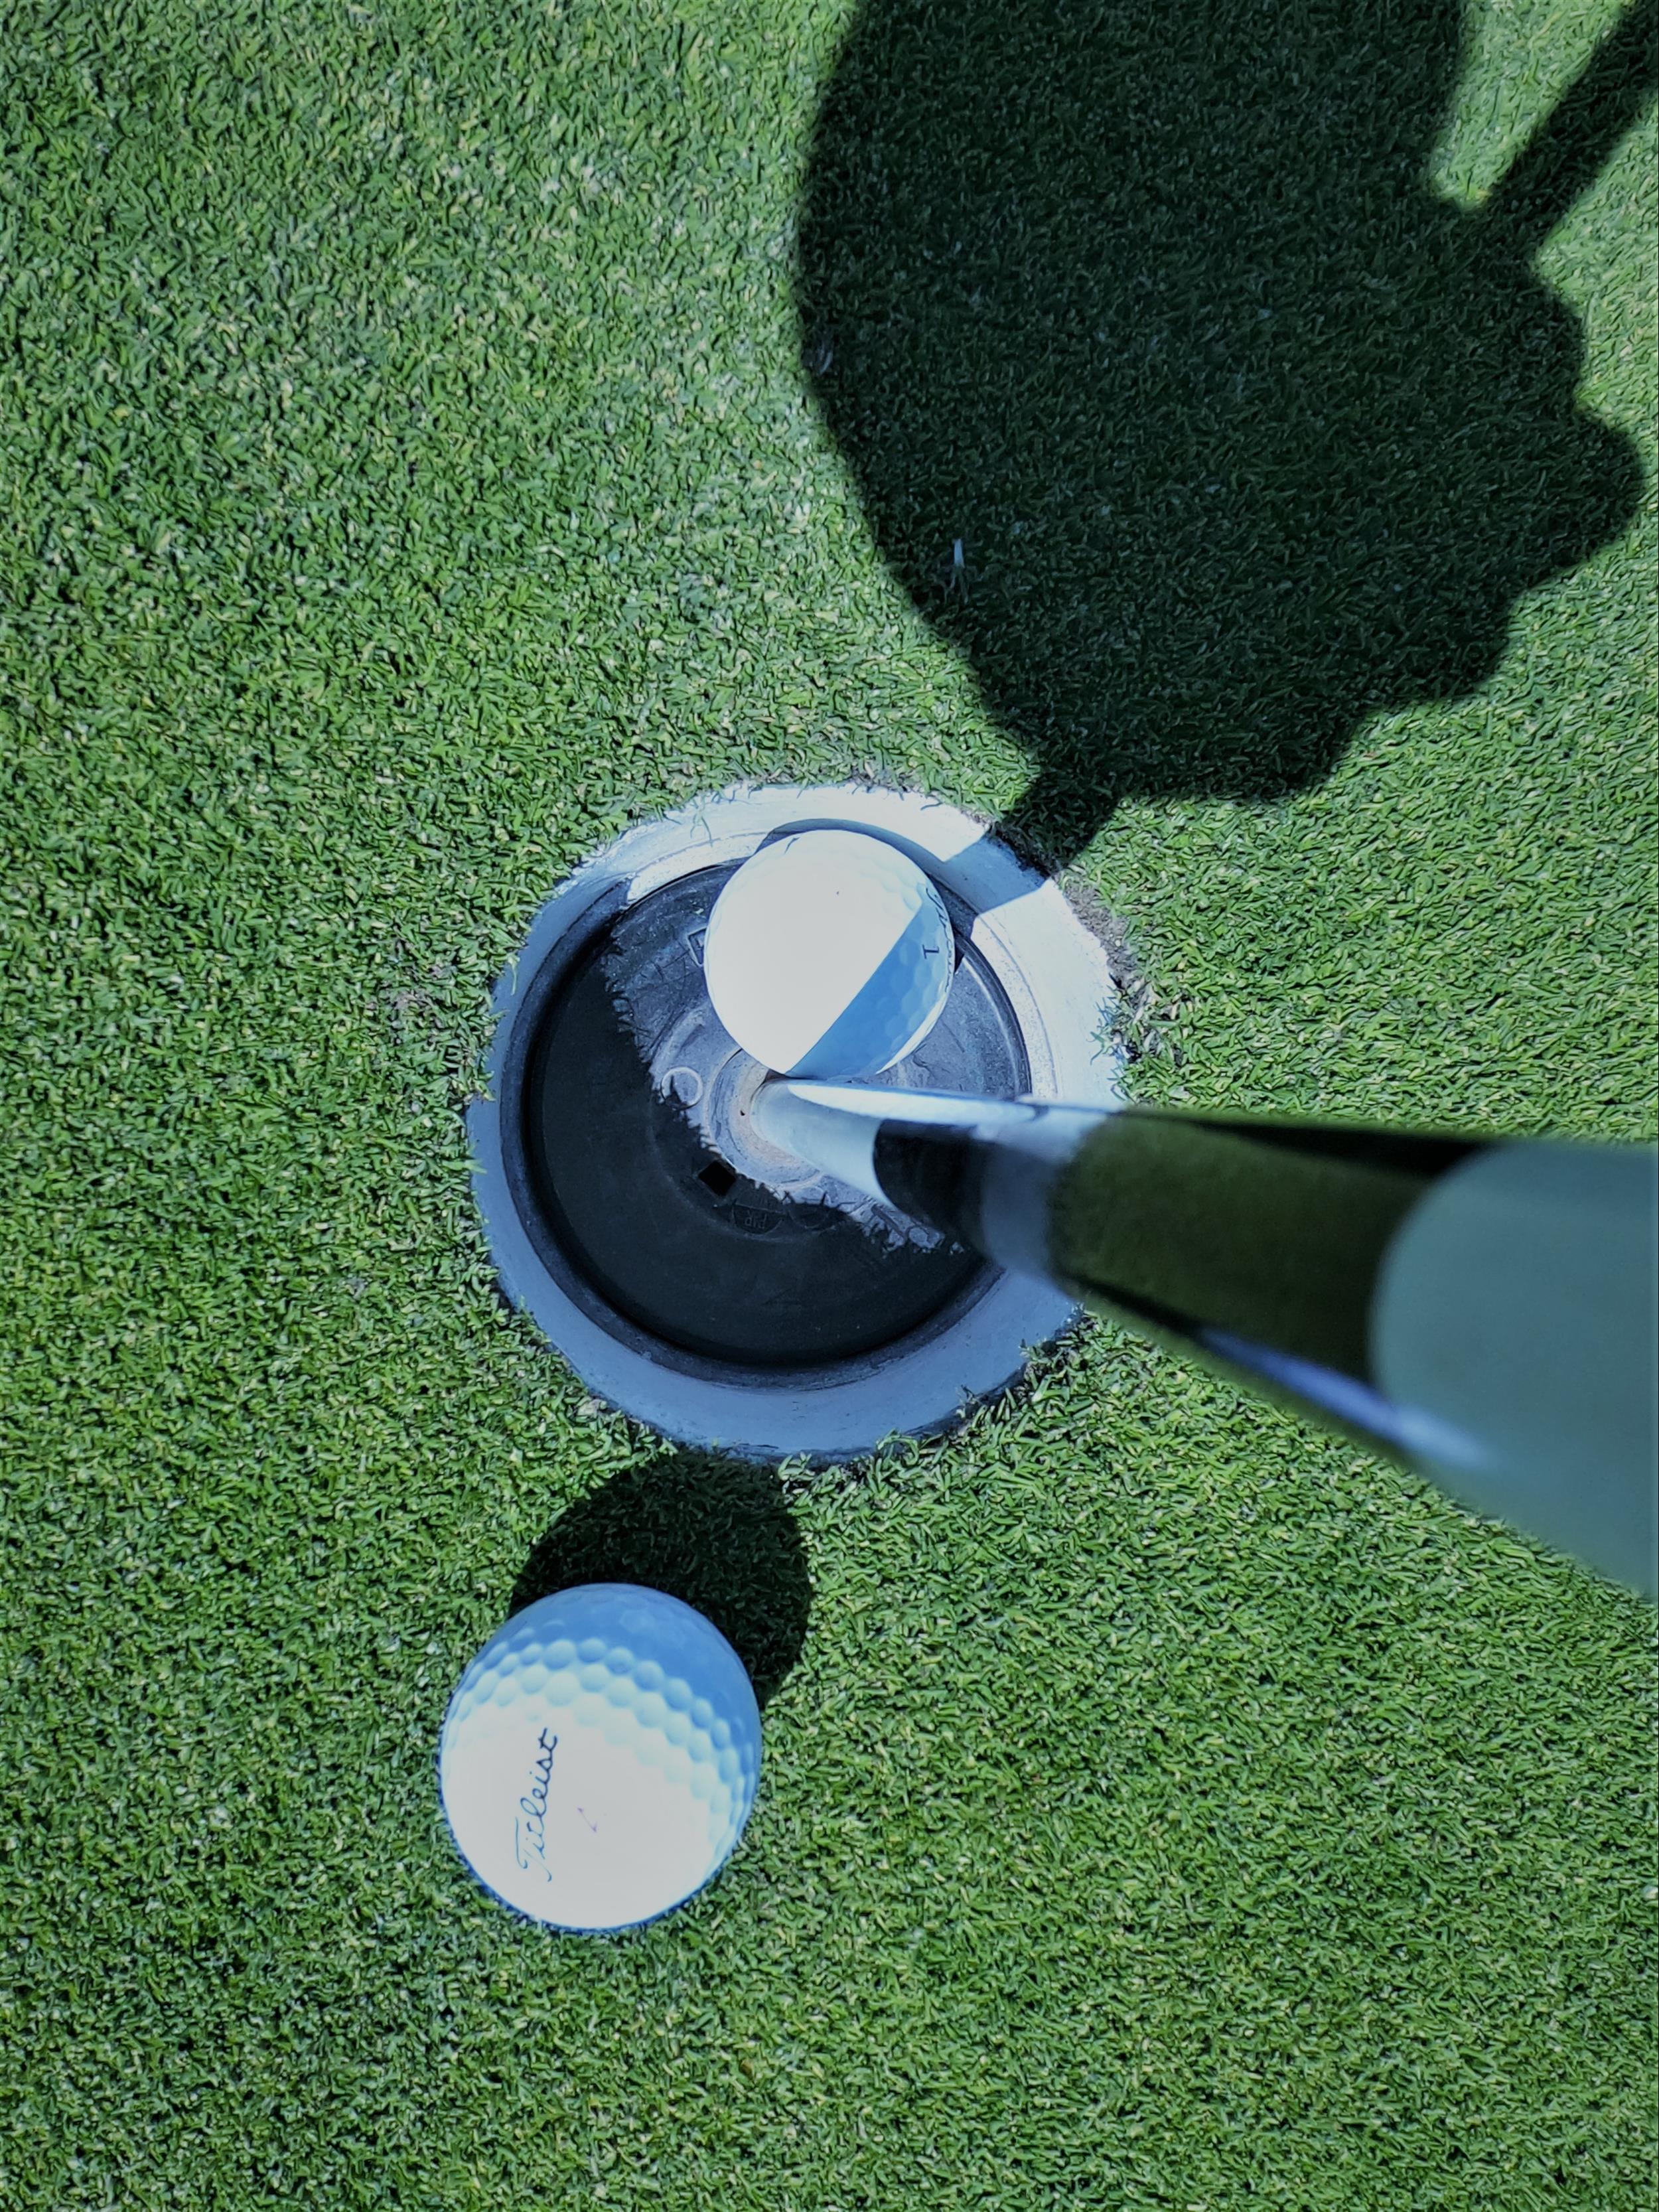 Red Arrow Golf Course